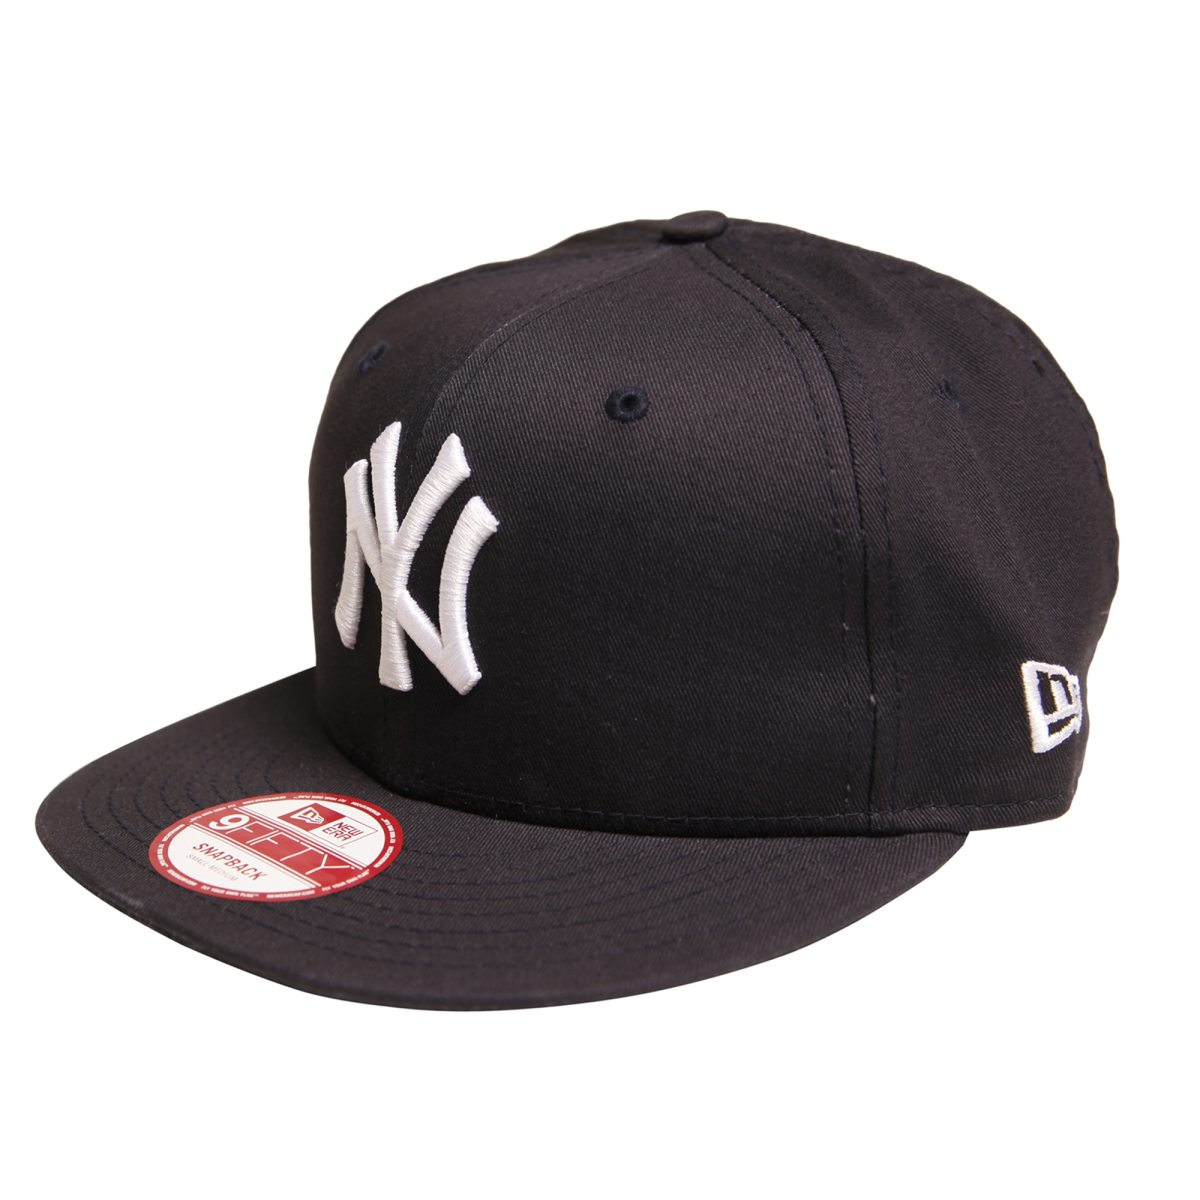 7dba91380 Buy caps team realtree kamuflasje hodeplagg . Shop every store on ...